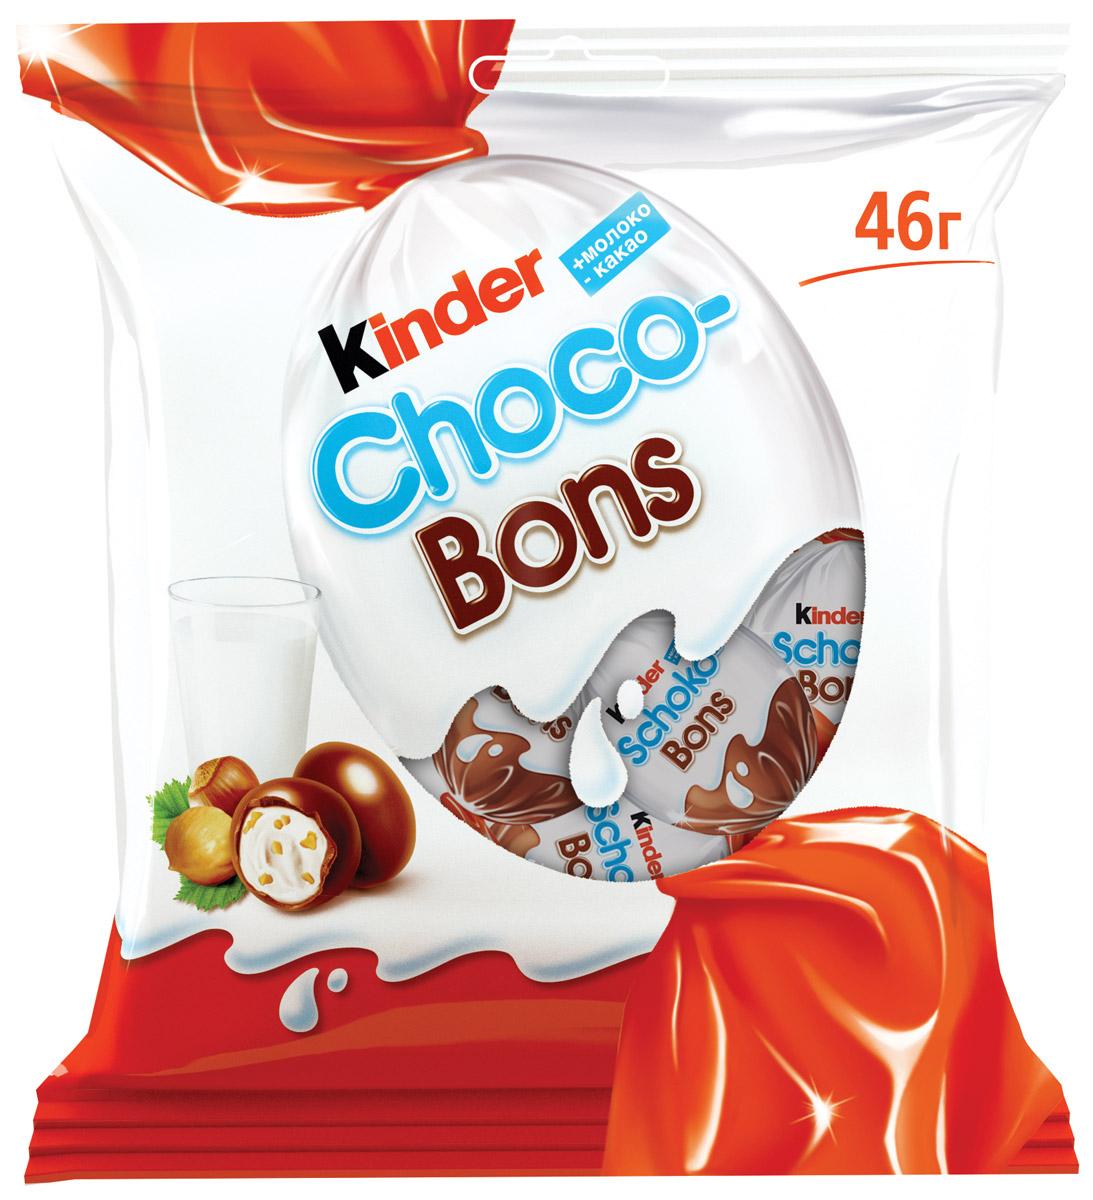 Kinder Choco Bons конфеты из молочного шоколада с молочно-ореховой начинкой, 46 г kinder choco bons конфеты из молочного шоколада с молочно ореховой начинкой 46 г